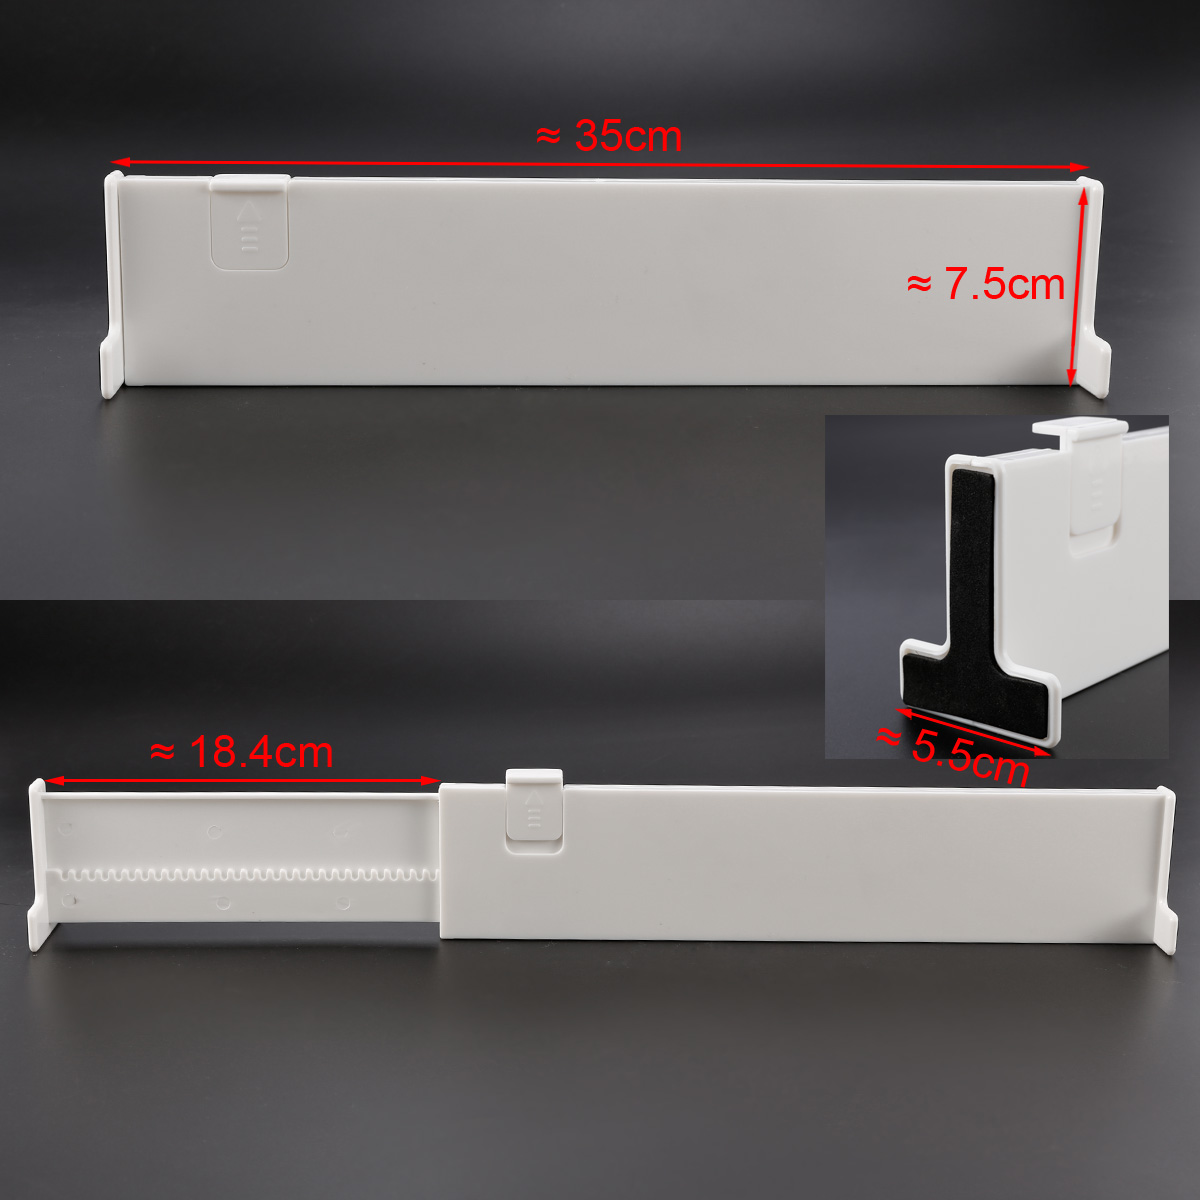 SET 4 DRAWER DIVIDERS WHITE CLIP LOCKED EXPANDABLE KITCHEN BEDROOM ORGANISER NEW